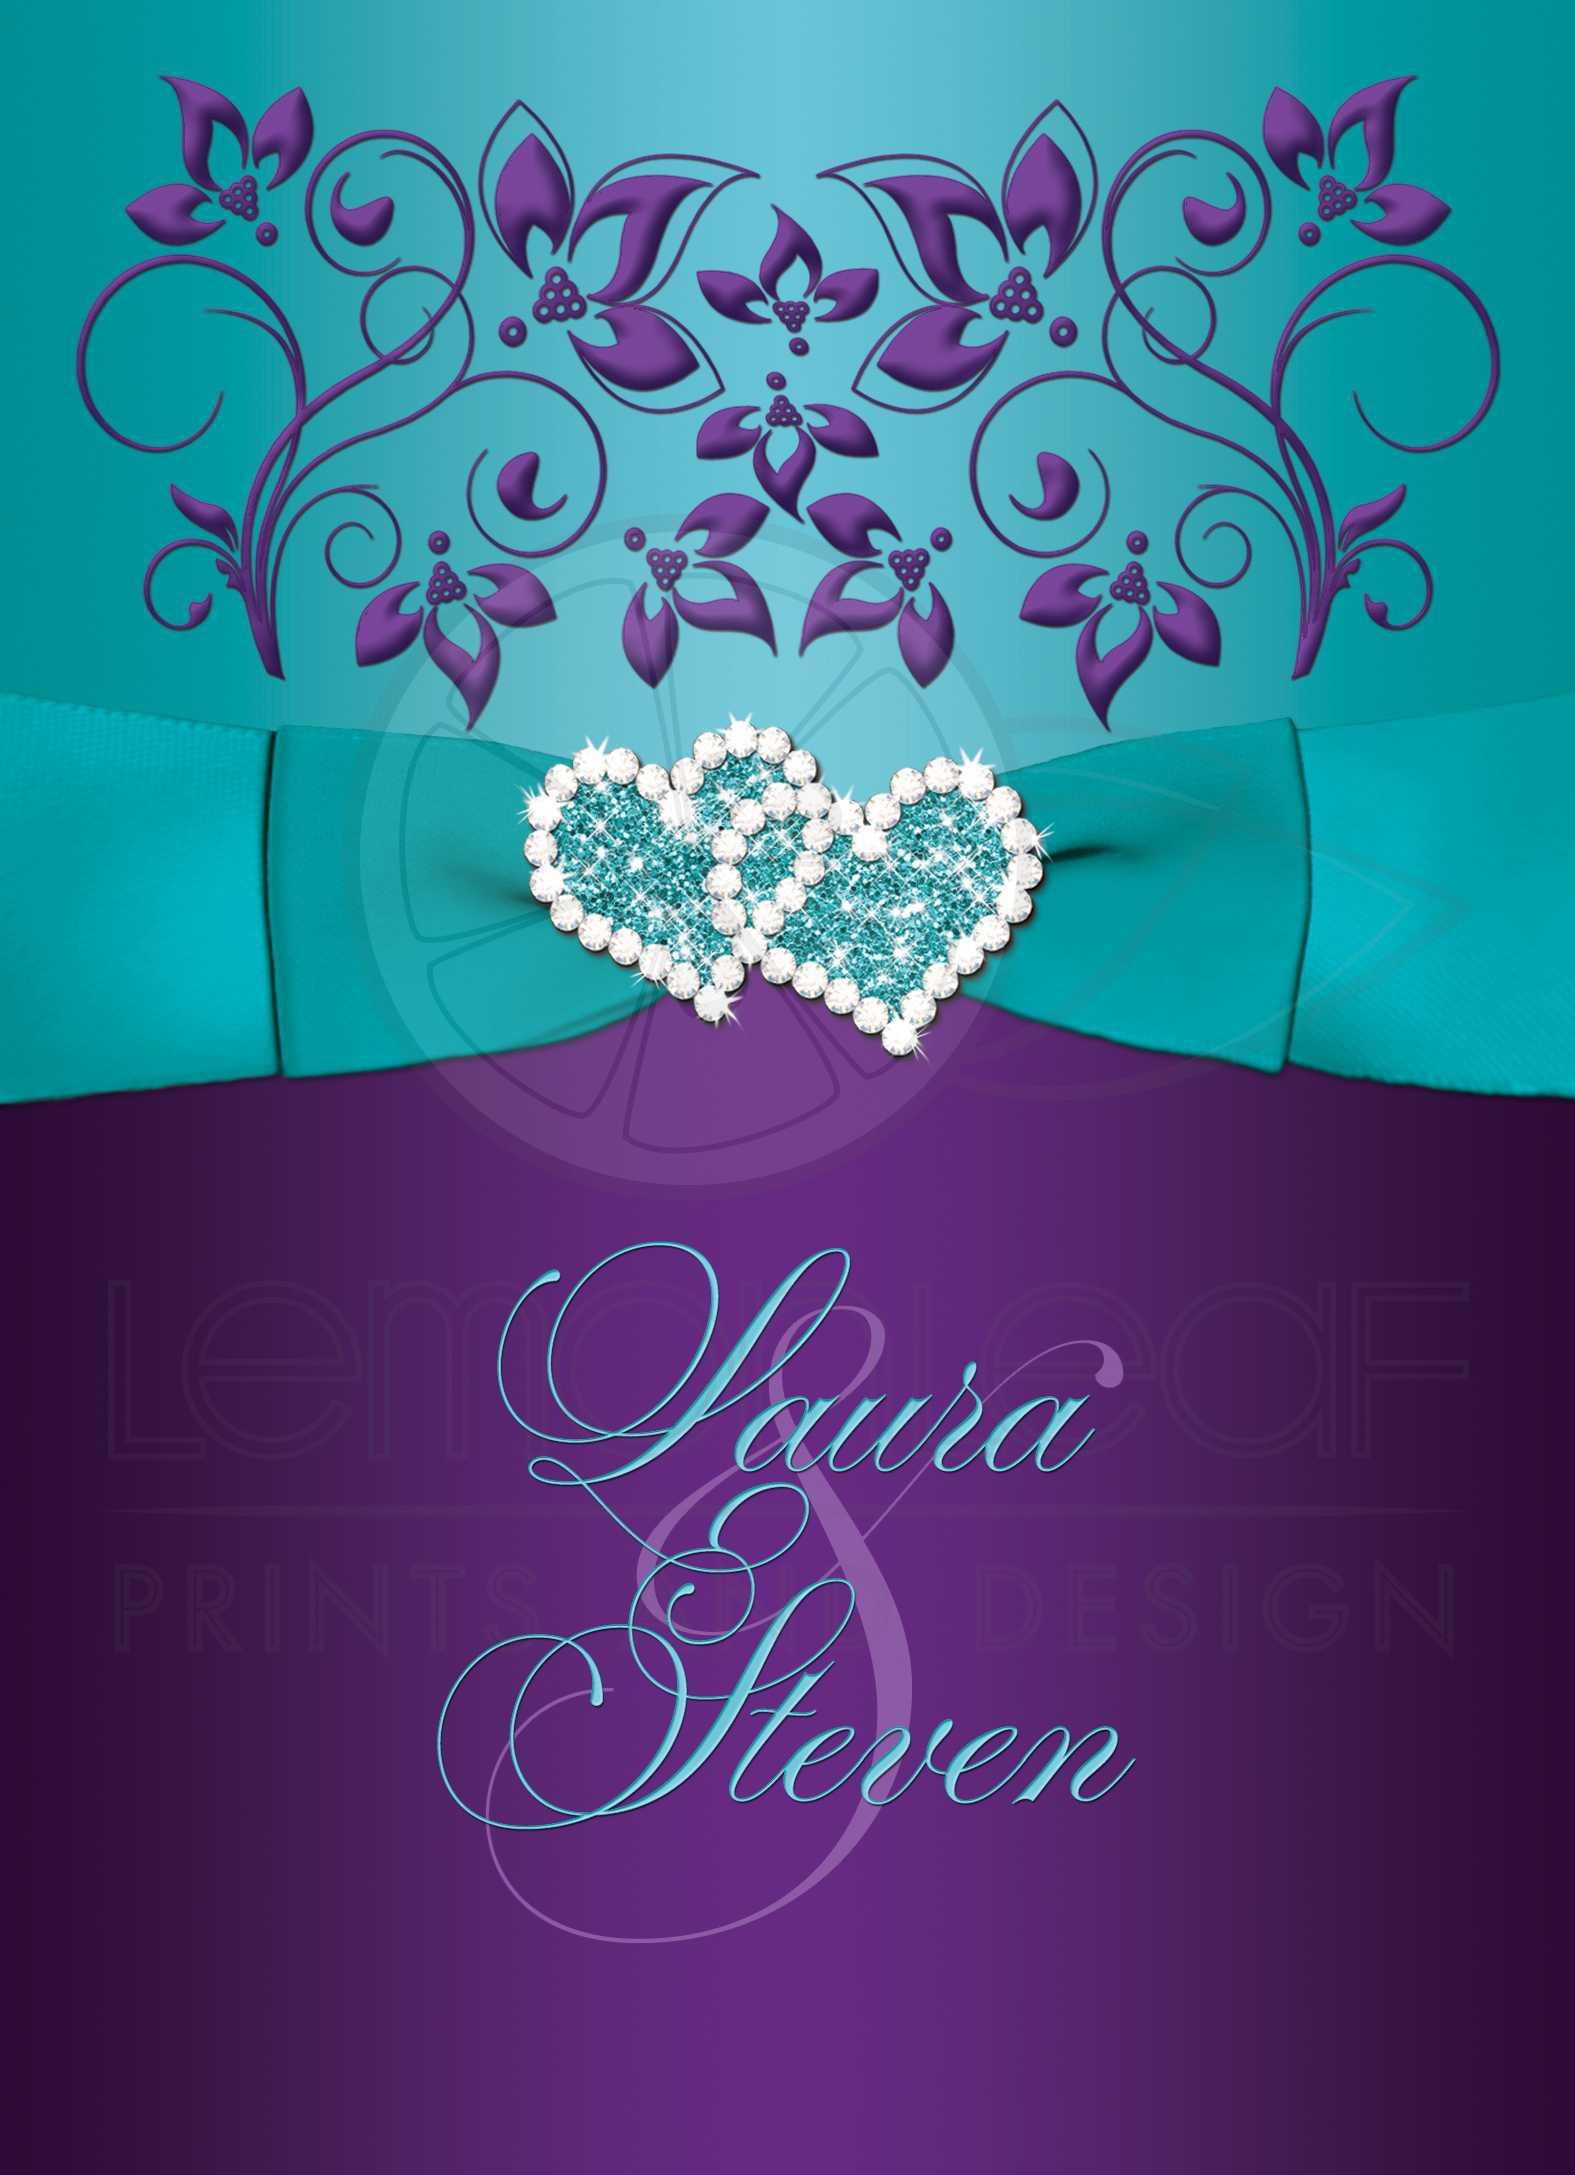 wedding invitation purple aqua white floral printed ribbon double jeweled hearts - Purple And Turquoise Wedding Invitations